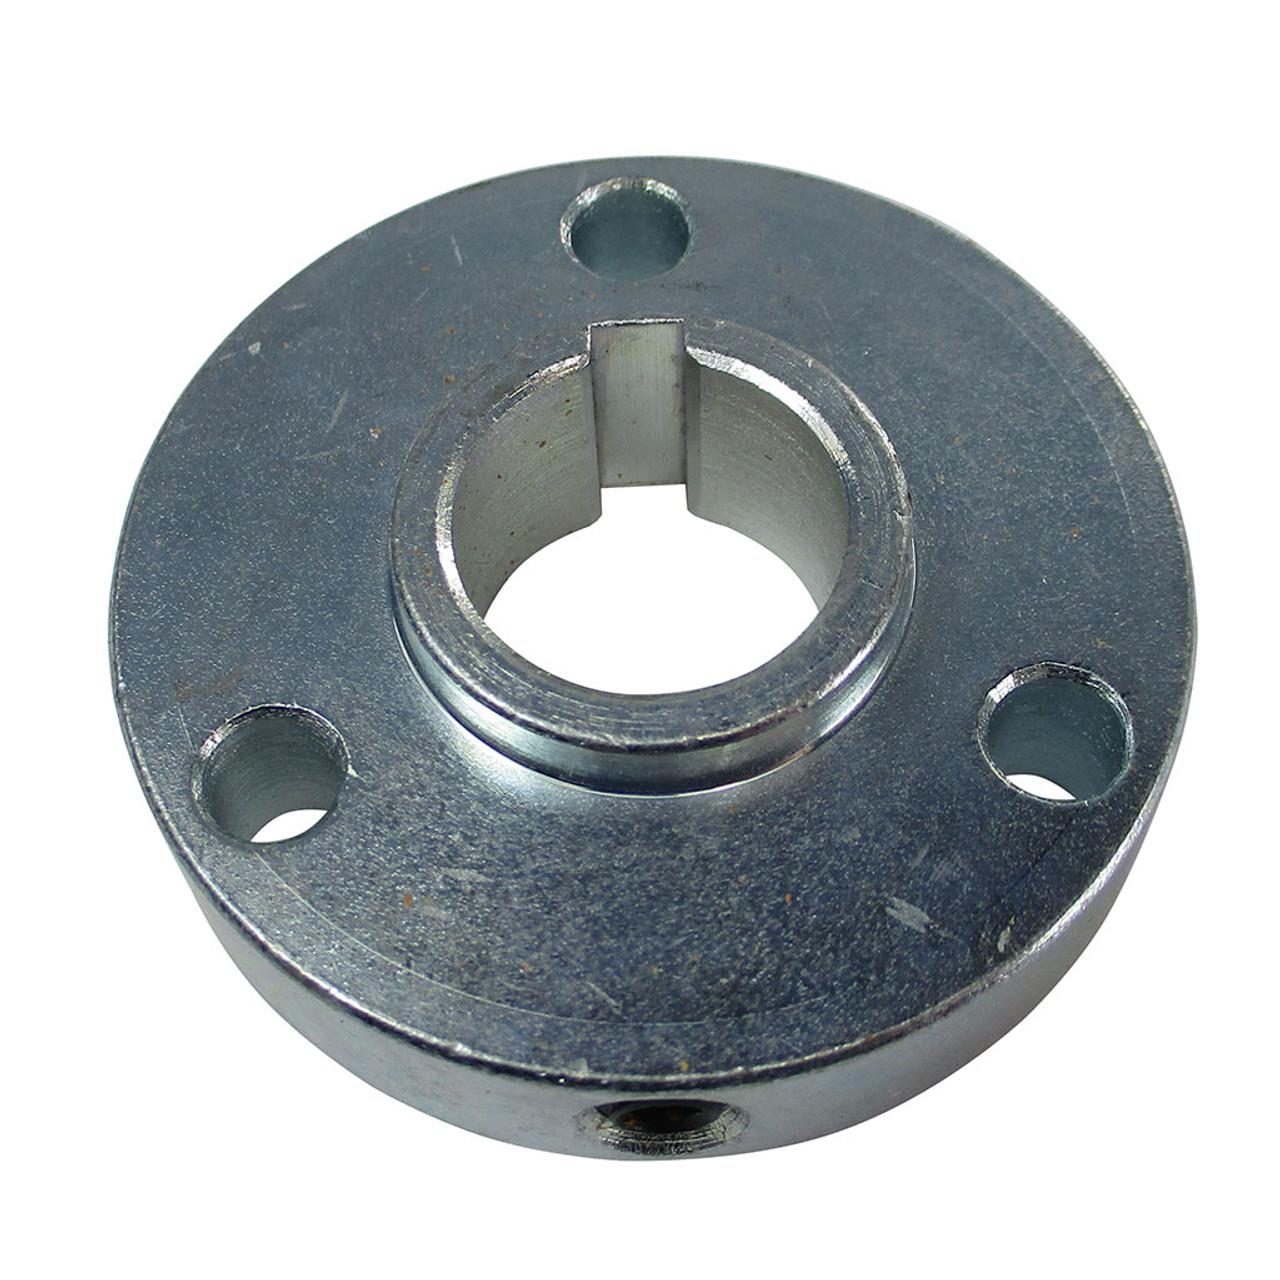 "Hub, Steel, 2-1/8"" OD, 3/4"" Bore, 1/2"" Thick, 3/16"" Keyway, 3 Hole On 1-11/16"" Bolt Circle, (P5256 Pattern)"